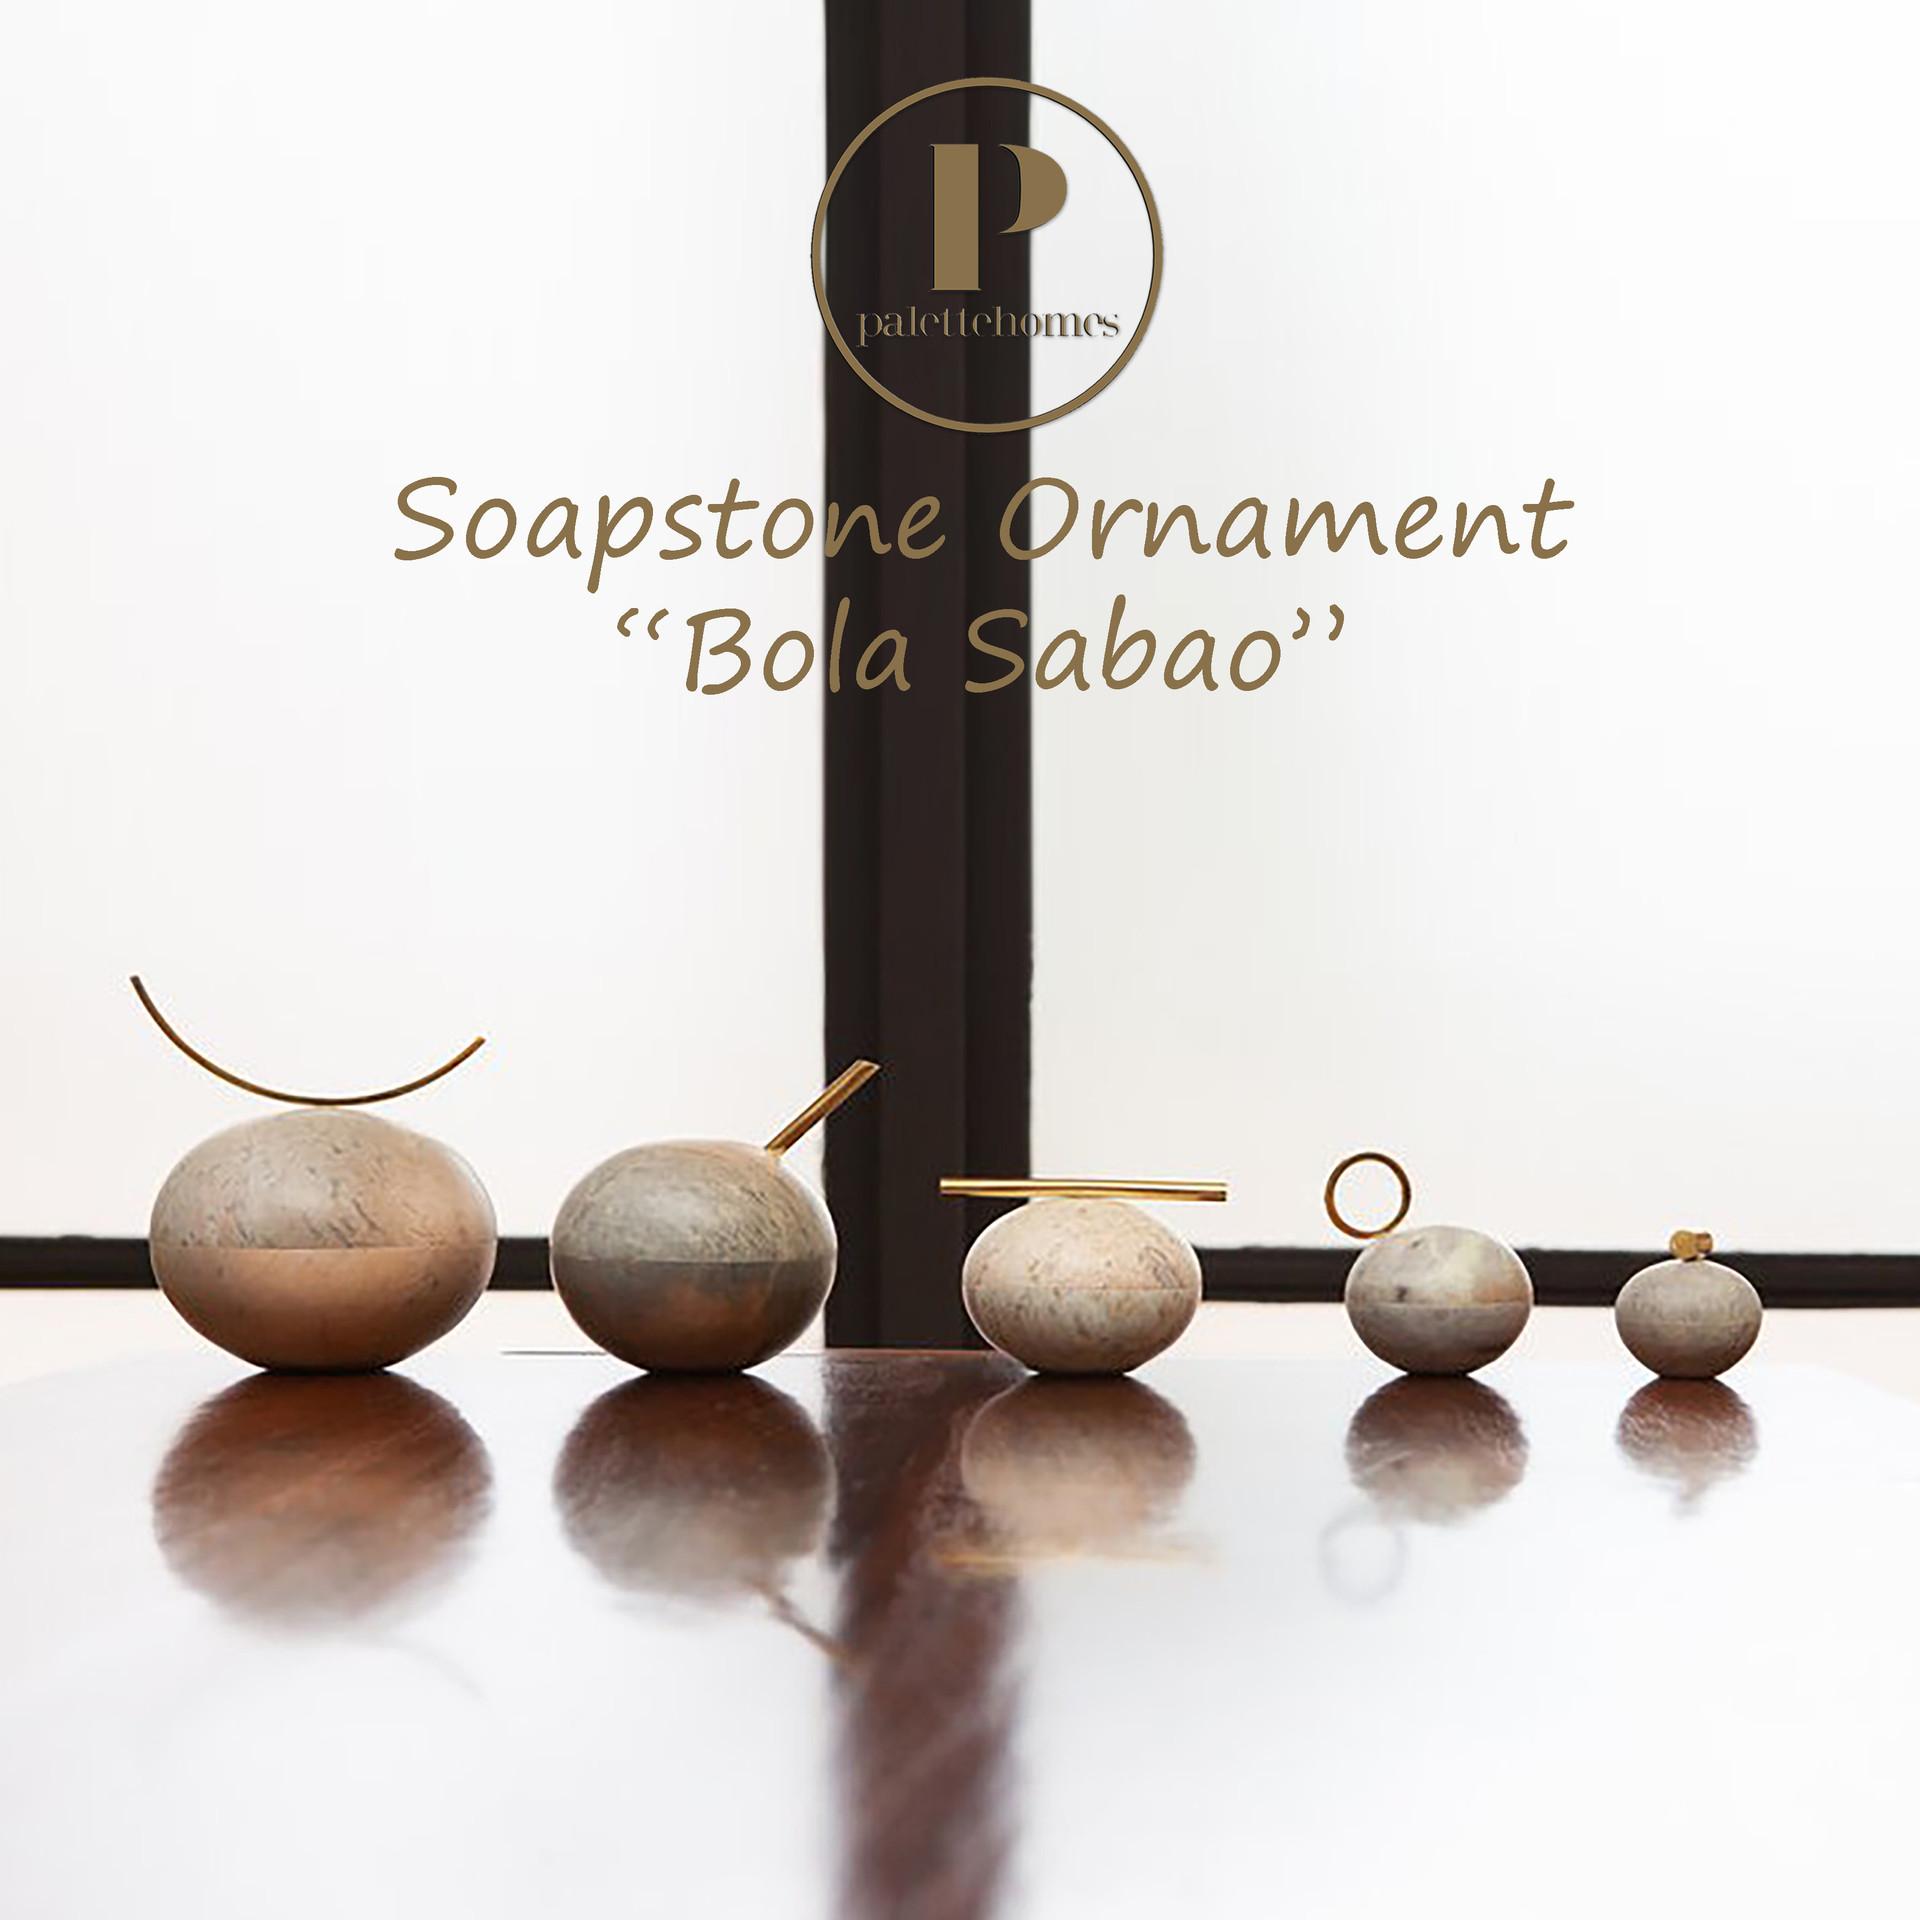 Bola Sabao: Unique soapstone containers